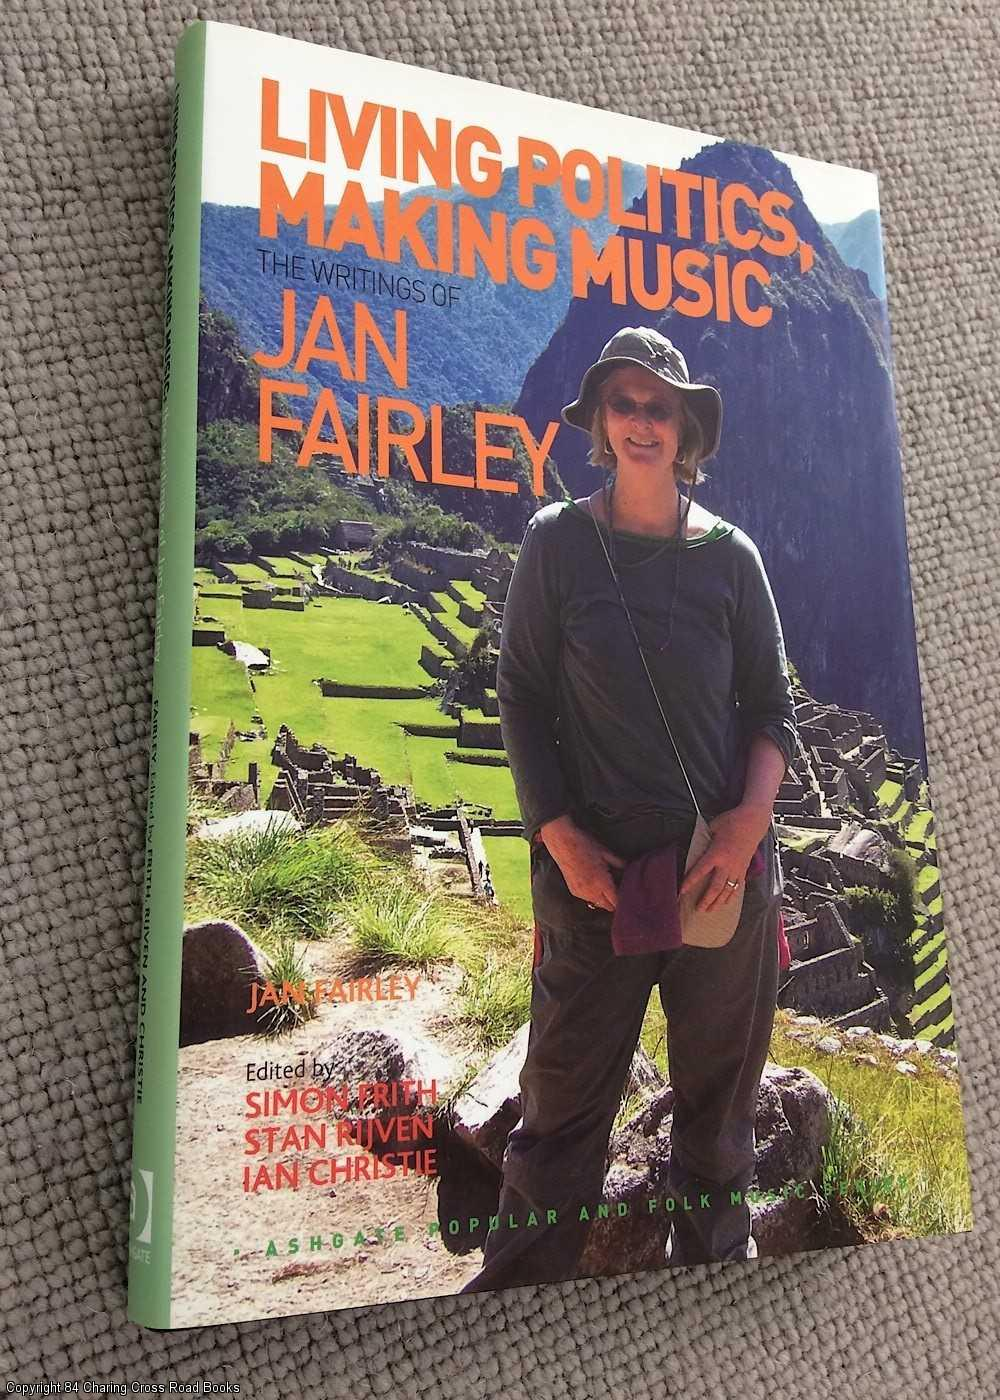 FRITH, SIMON, CHRISTIE, IAN, FAIRLEY, JAN - Living Politics, Making Music: The Writings of Jan Fairley